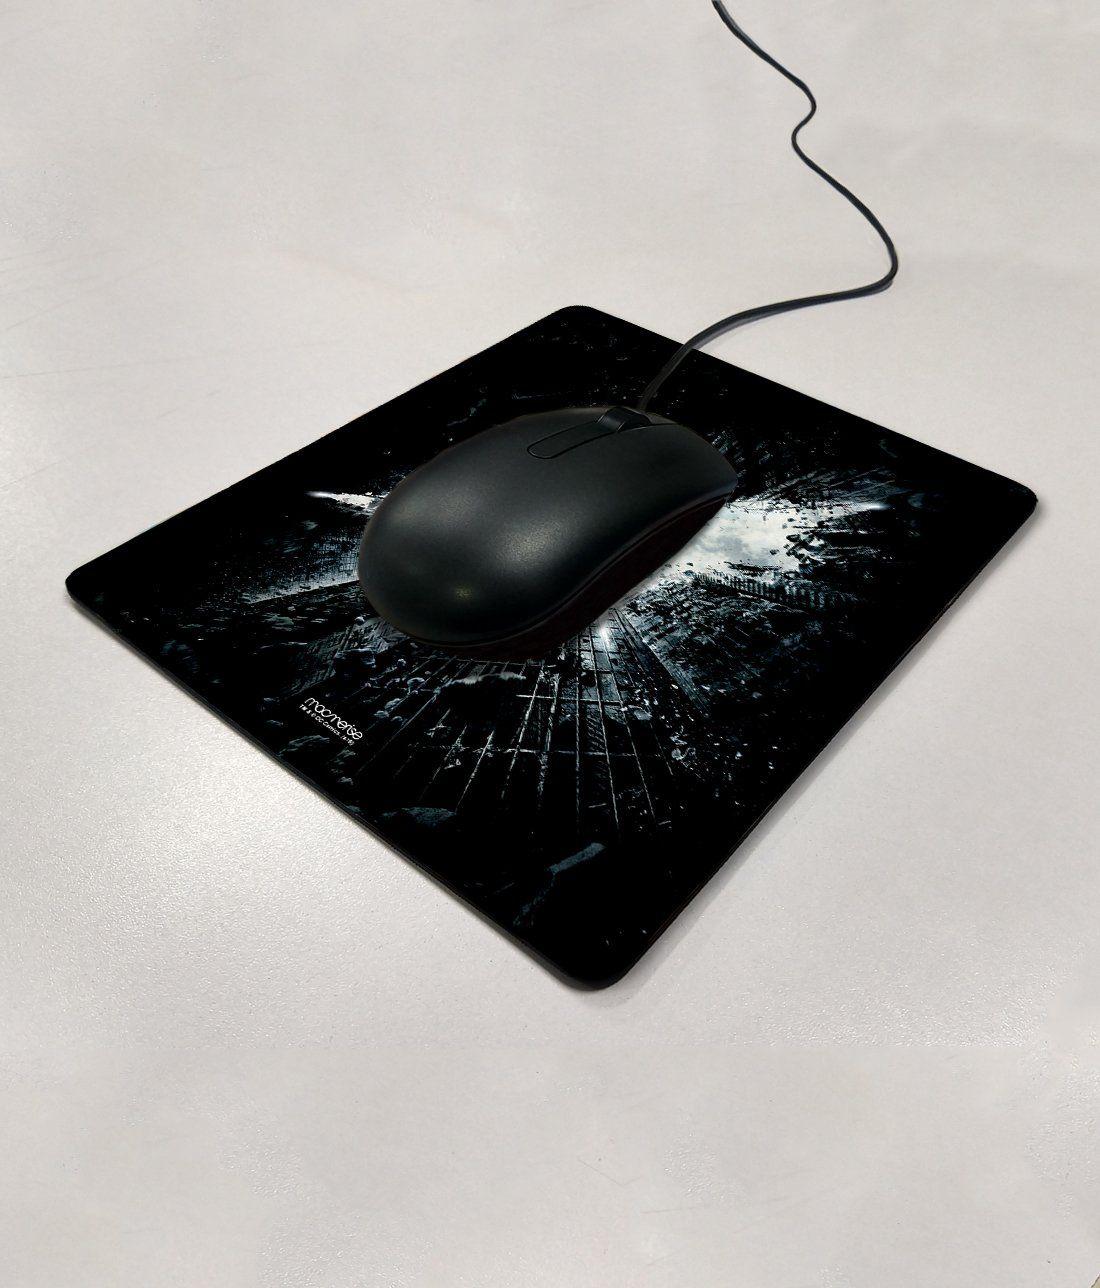 God of Gotham - Macmerise Mouse Pad